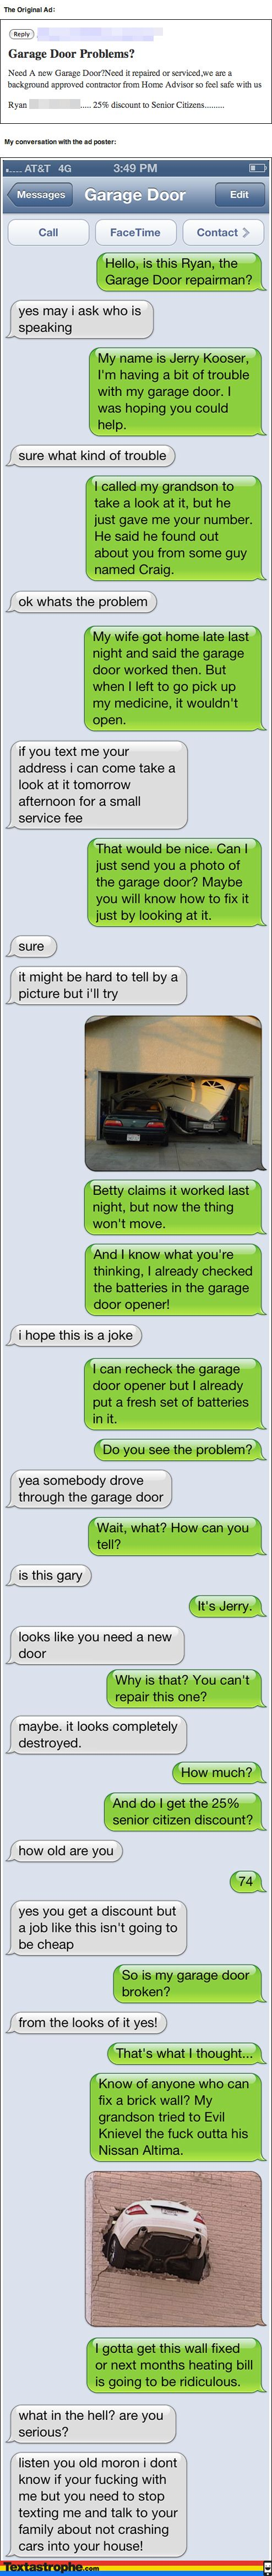 Hilarious texting prank at Textastrophe